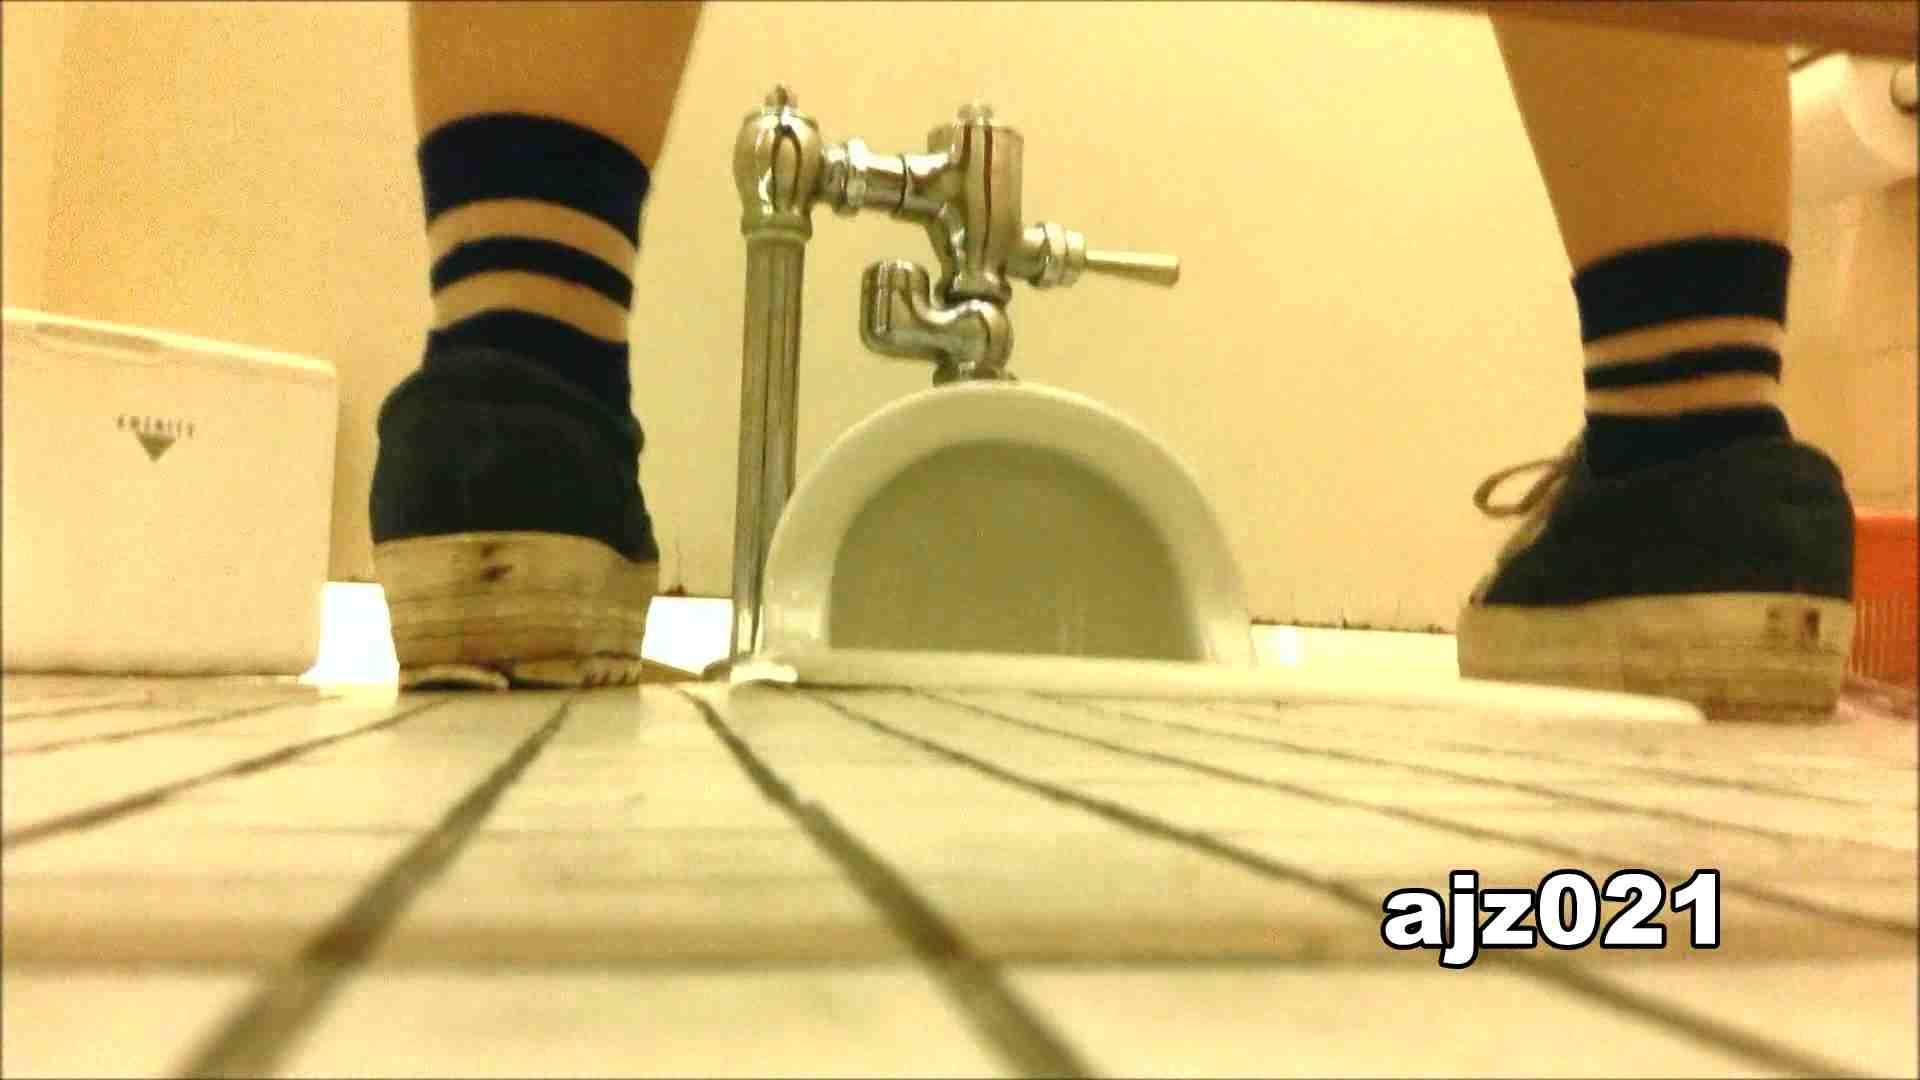 某有名大学女性洗面所 vol.21 美しいOLの裸体 濡れ場動画紹介 91pic 58